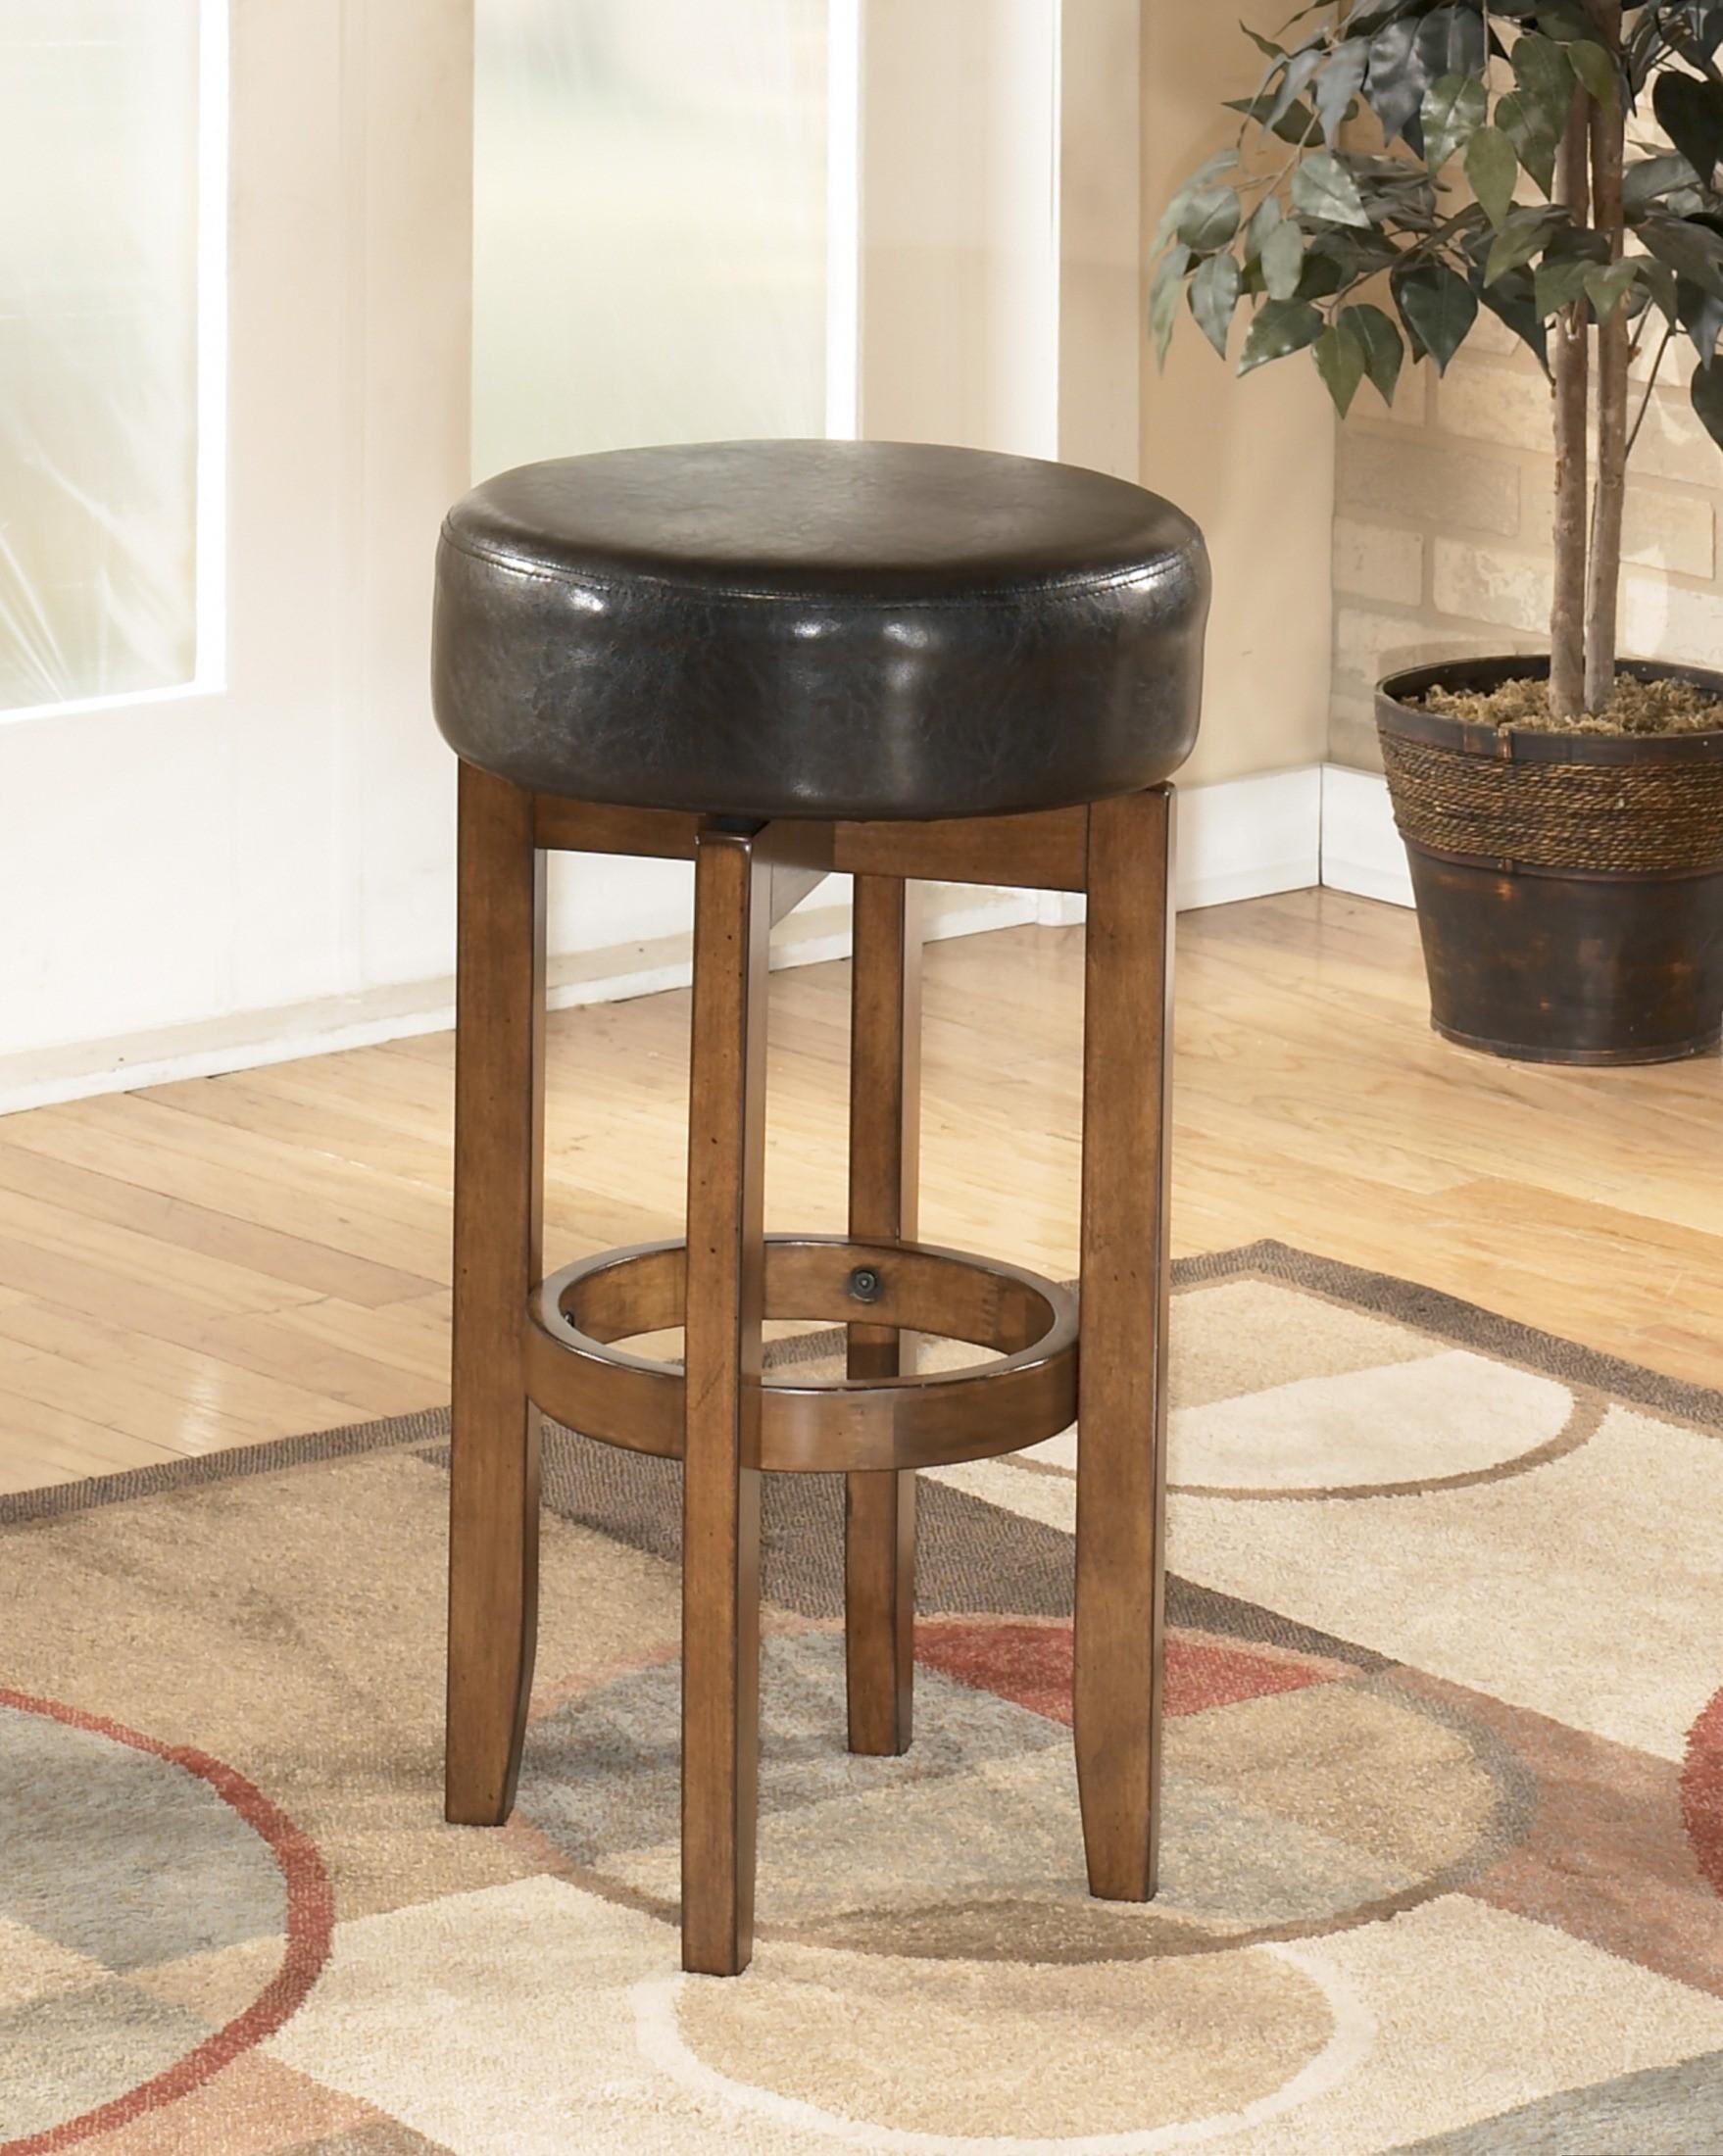 ashley furniture theo 30 inch backless swivel bar stool d158 230 stools. Black Bedroom Furniture Sets. Home Design Ideas